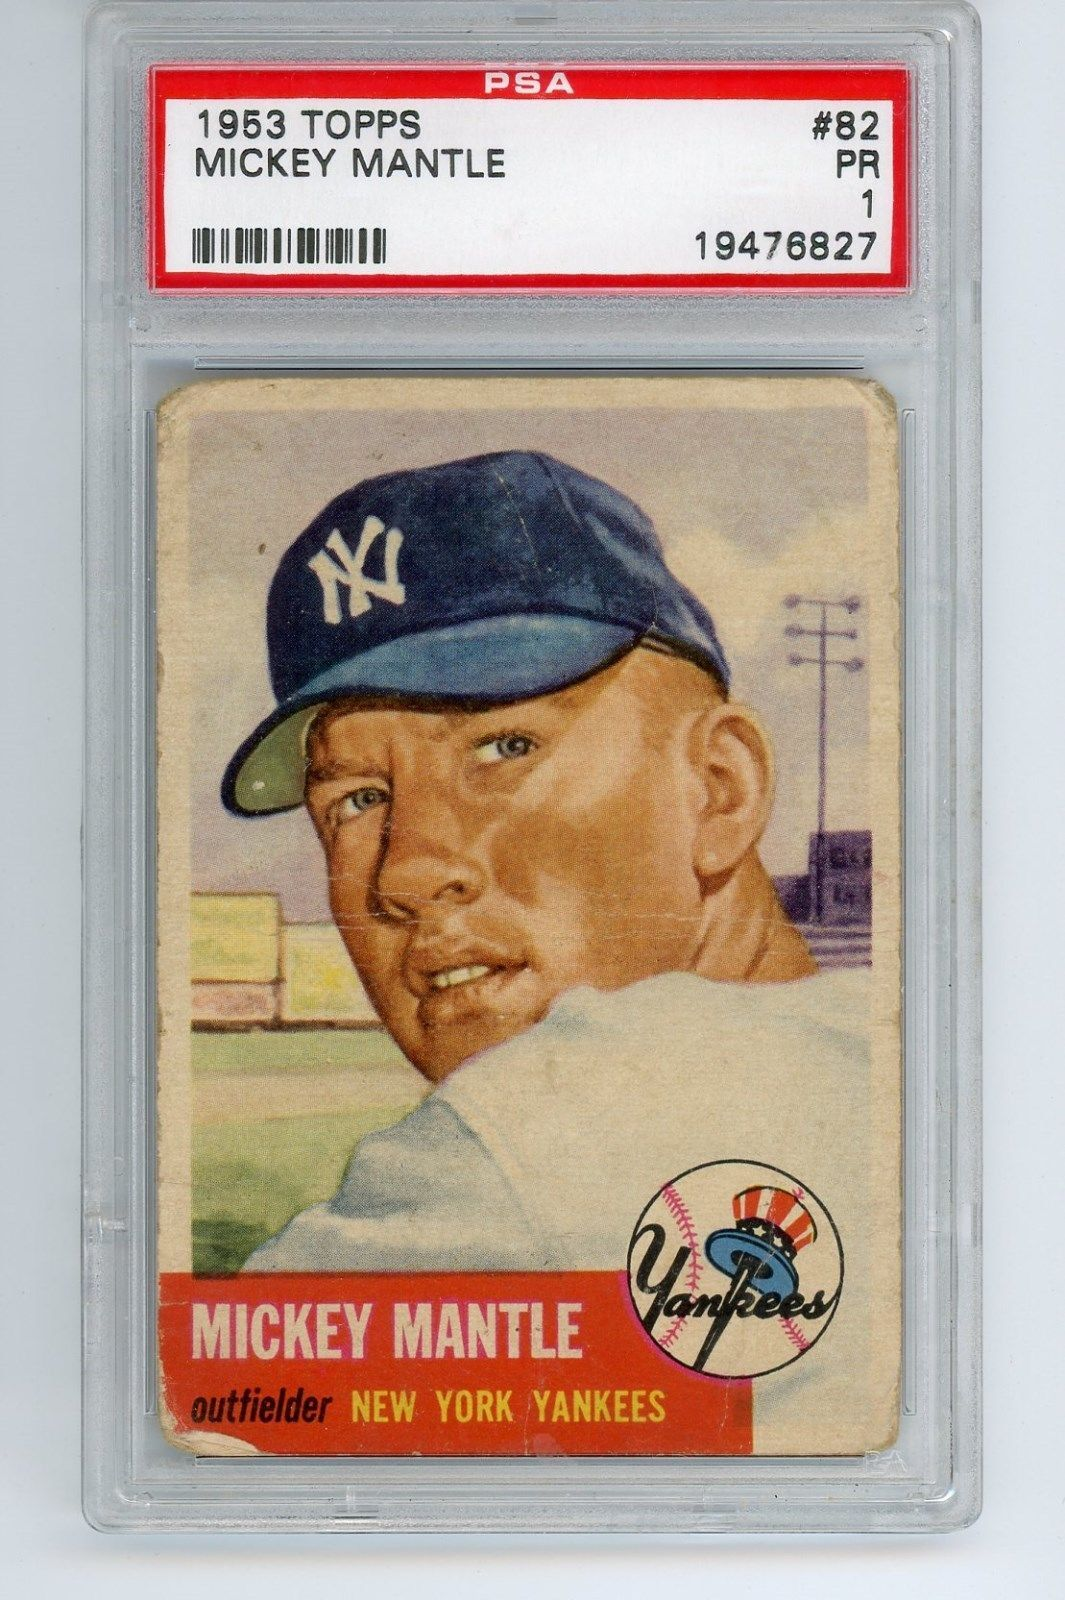 1953 topps baseball 82 mickey mantle psa 1 mickey